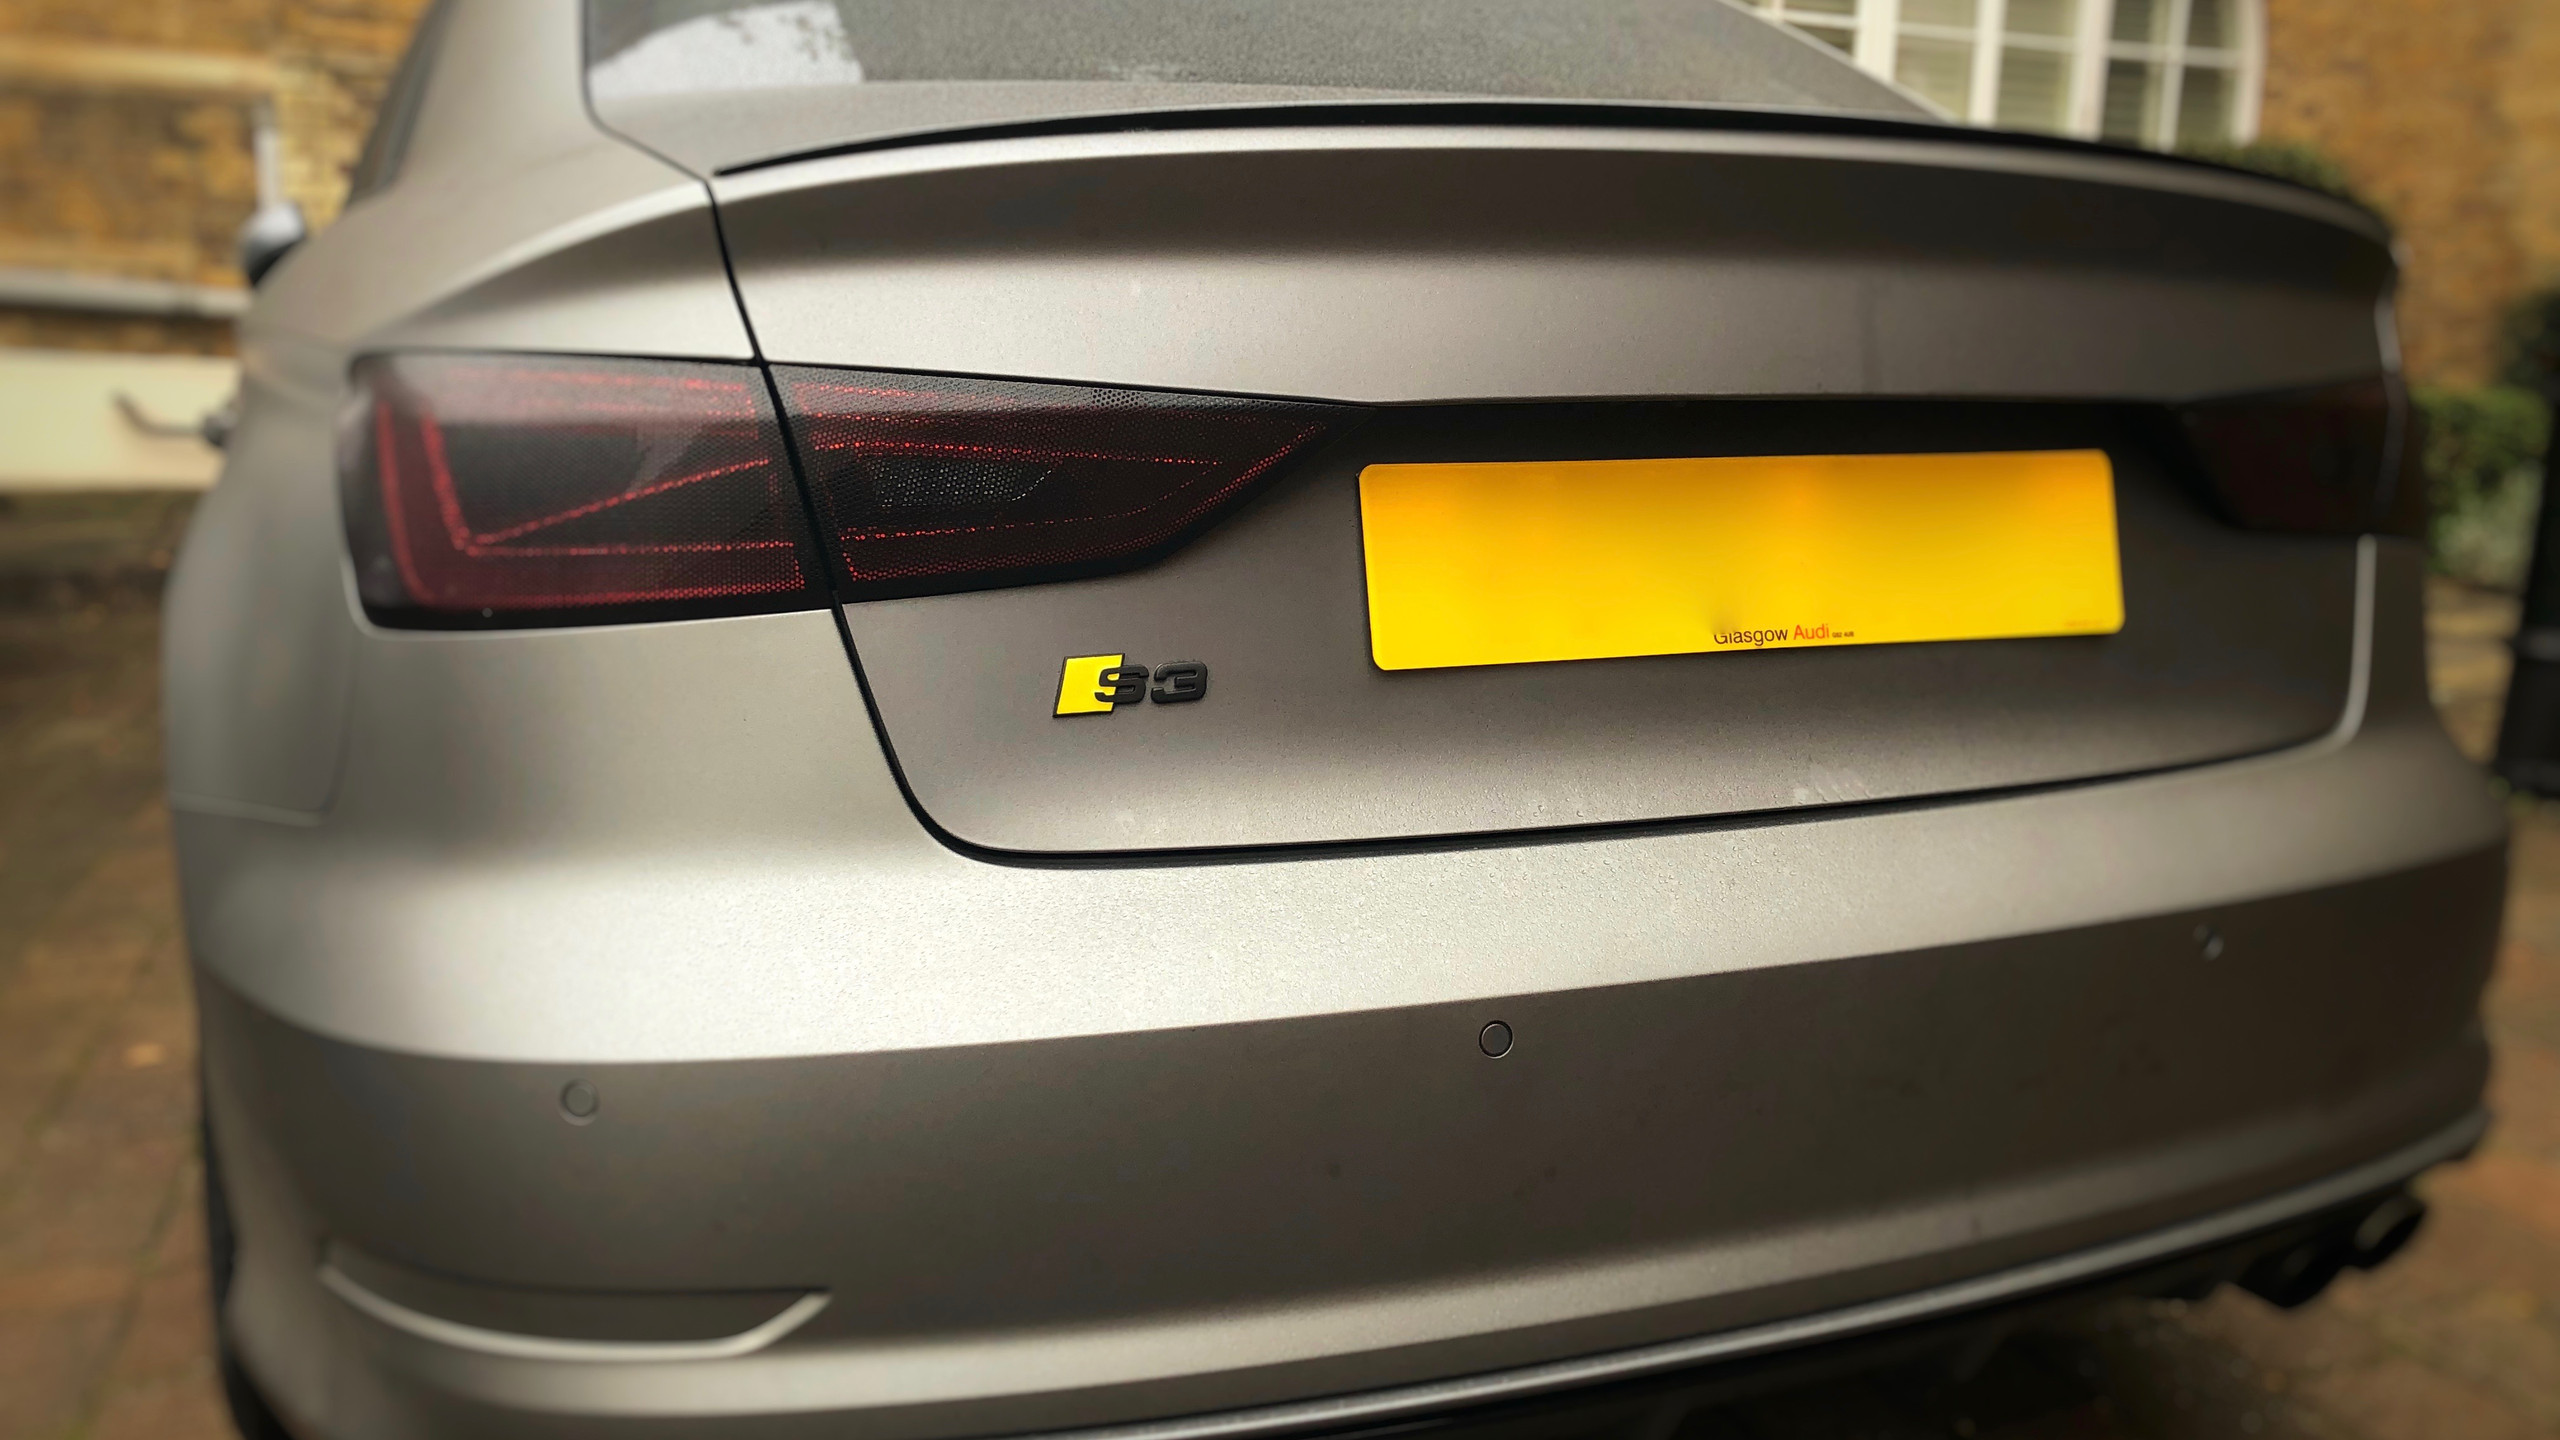 Audi Dashcam London Goluk T1 T3 Shield-IT